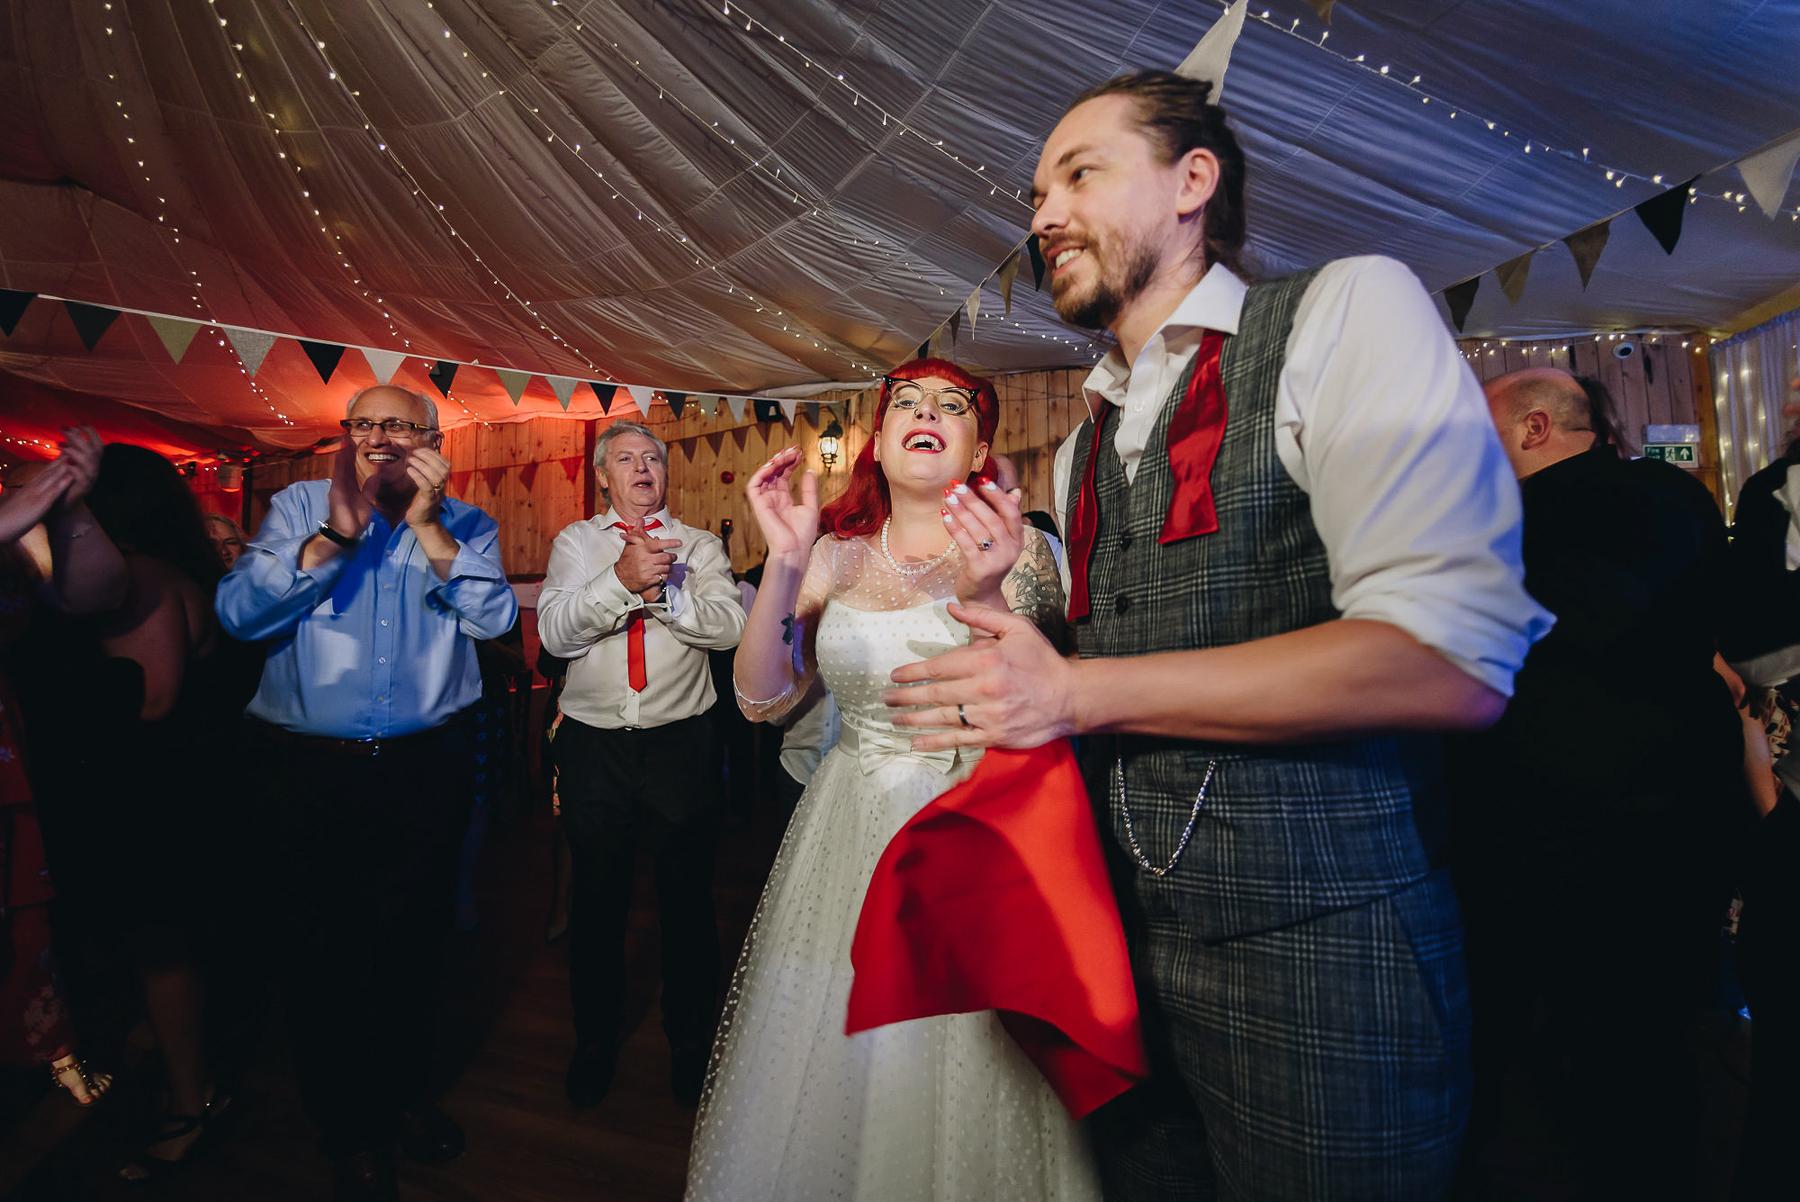 Wellbeing_Farm_Wedding_Photography_The_Pin-Up_Bride_Lara_Shaun-179.jpg